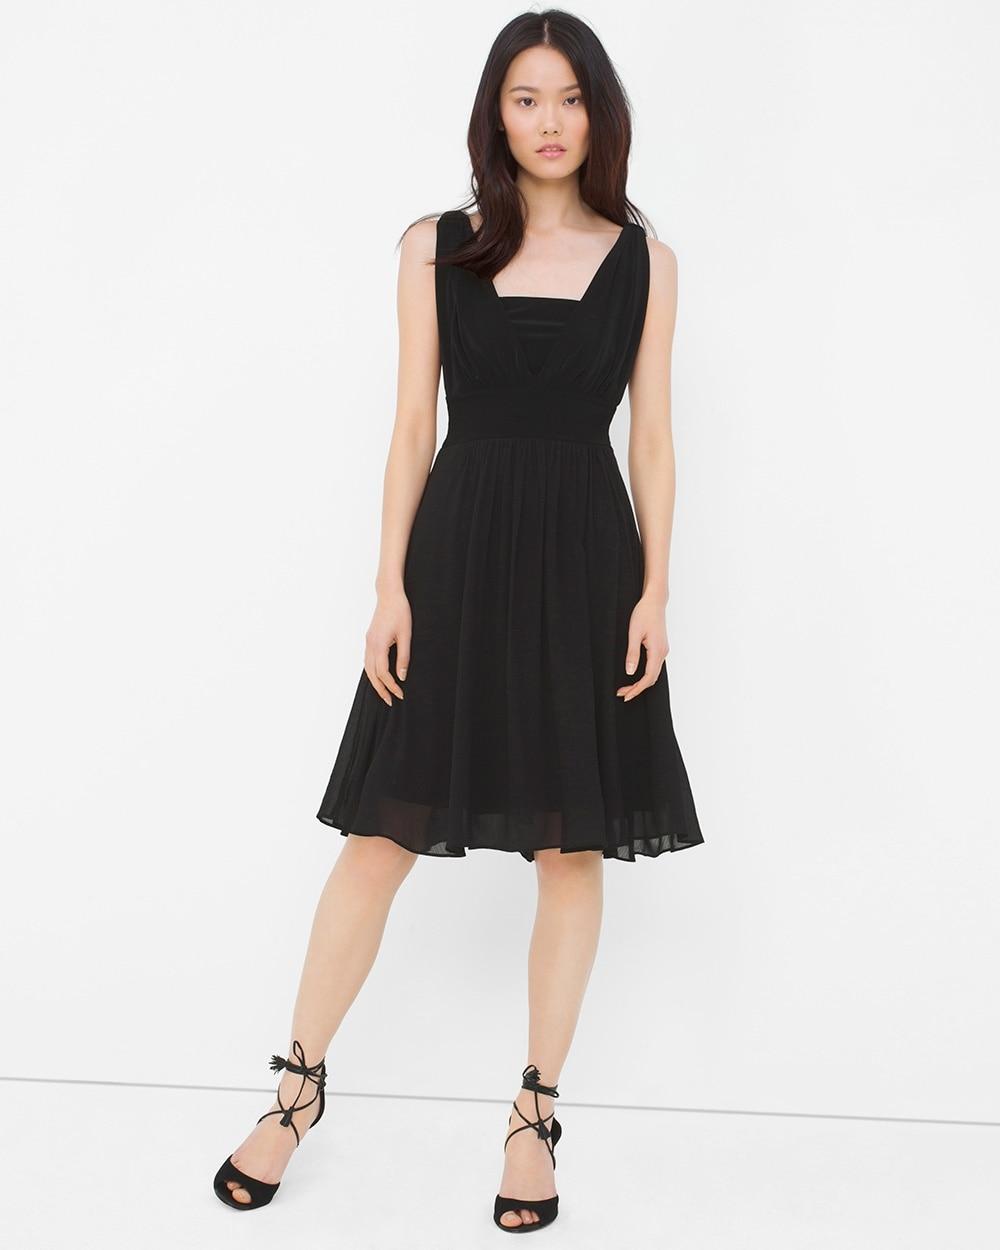 Genius Chiffon Convertible Black Dress White House Black Market